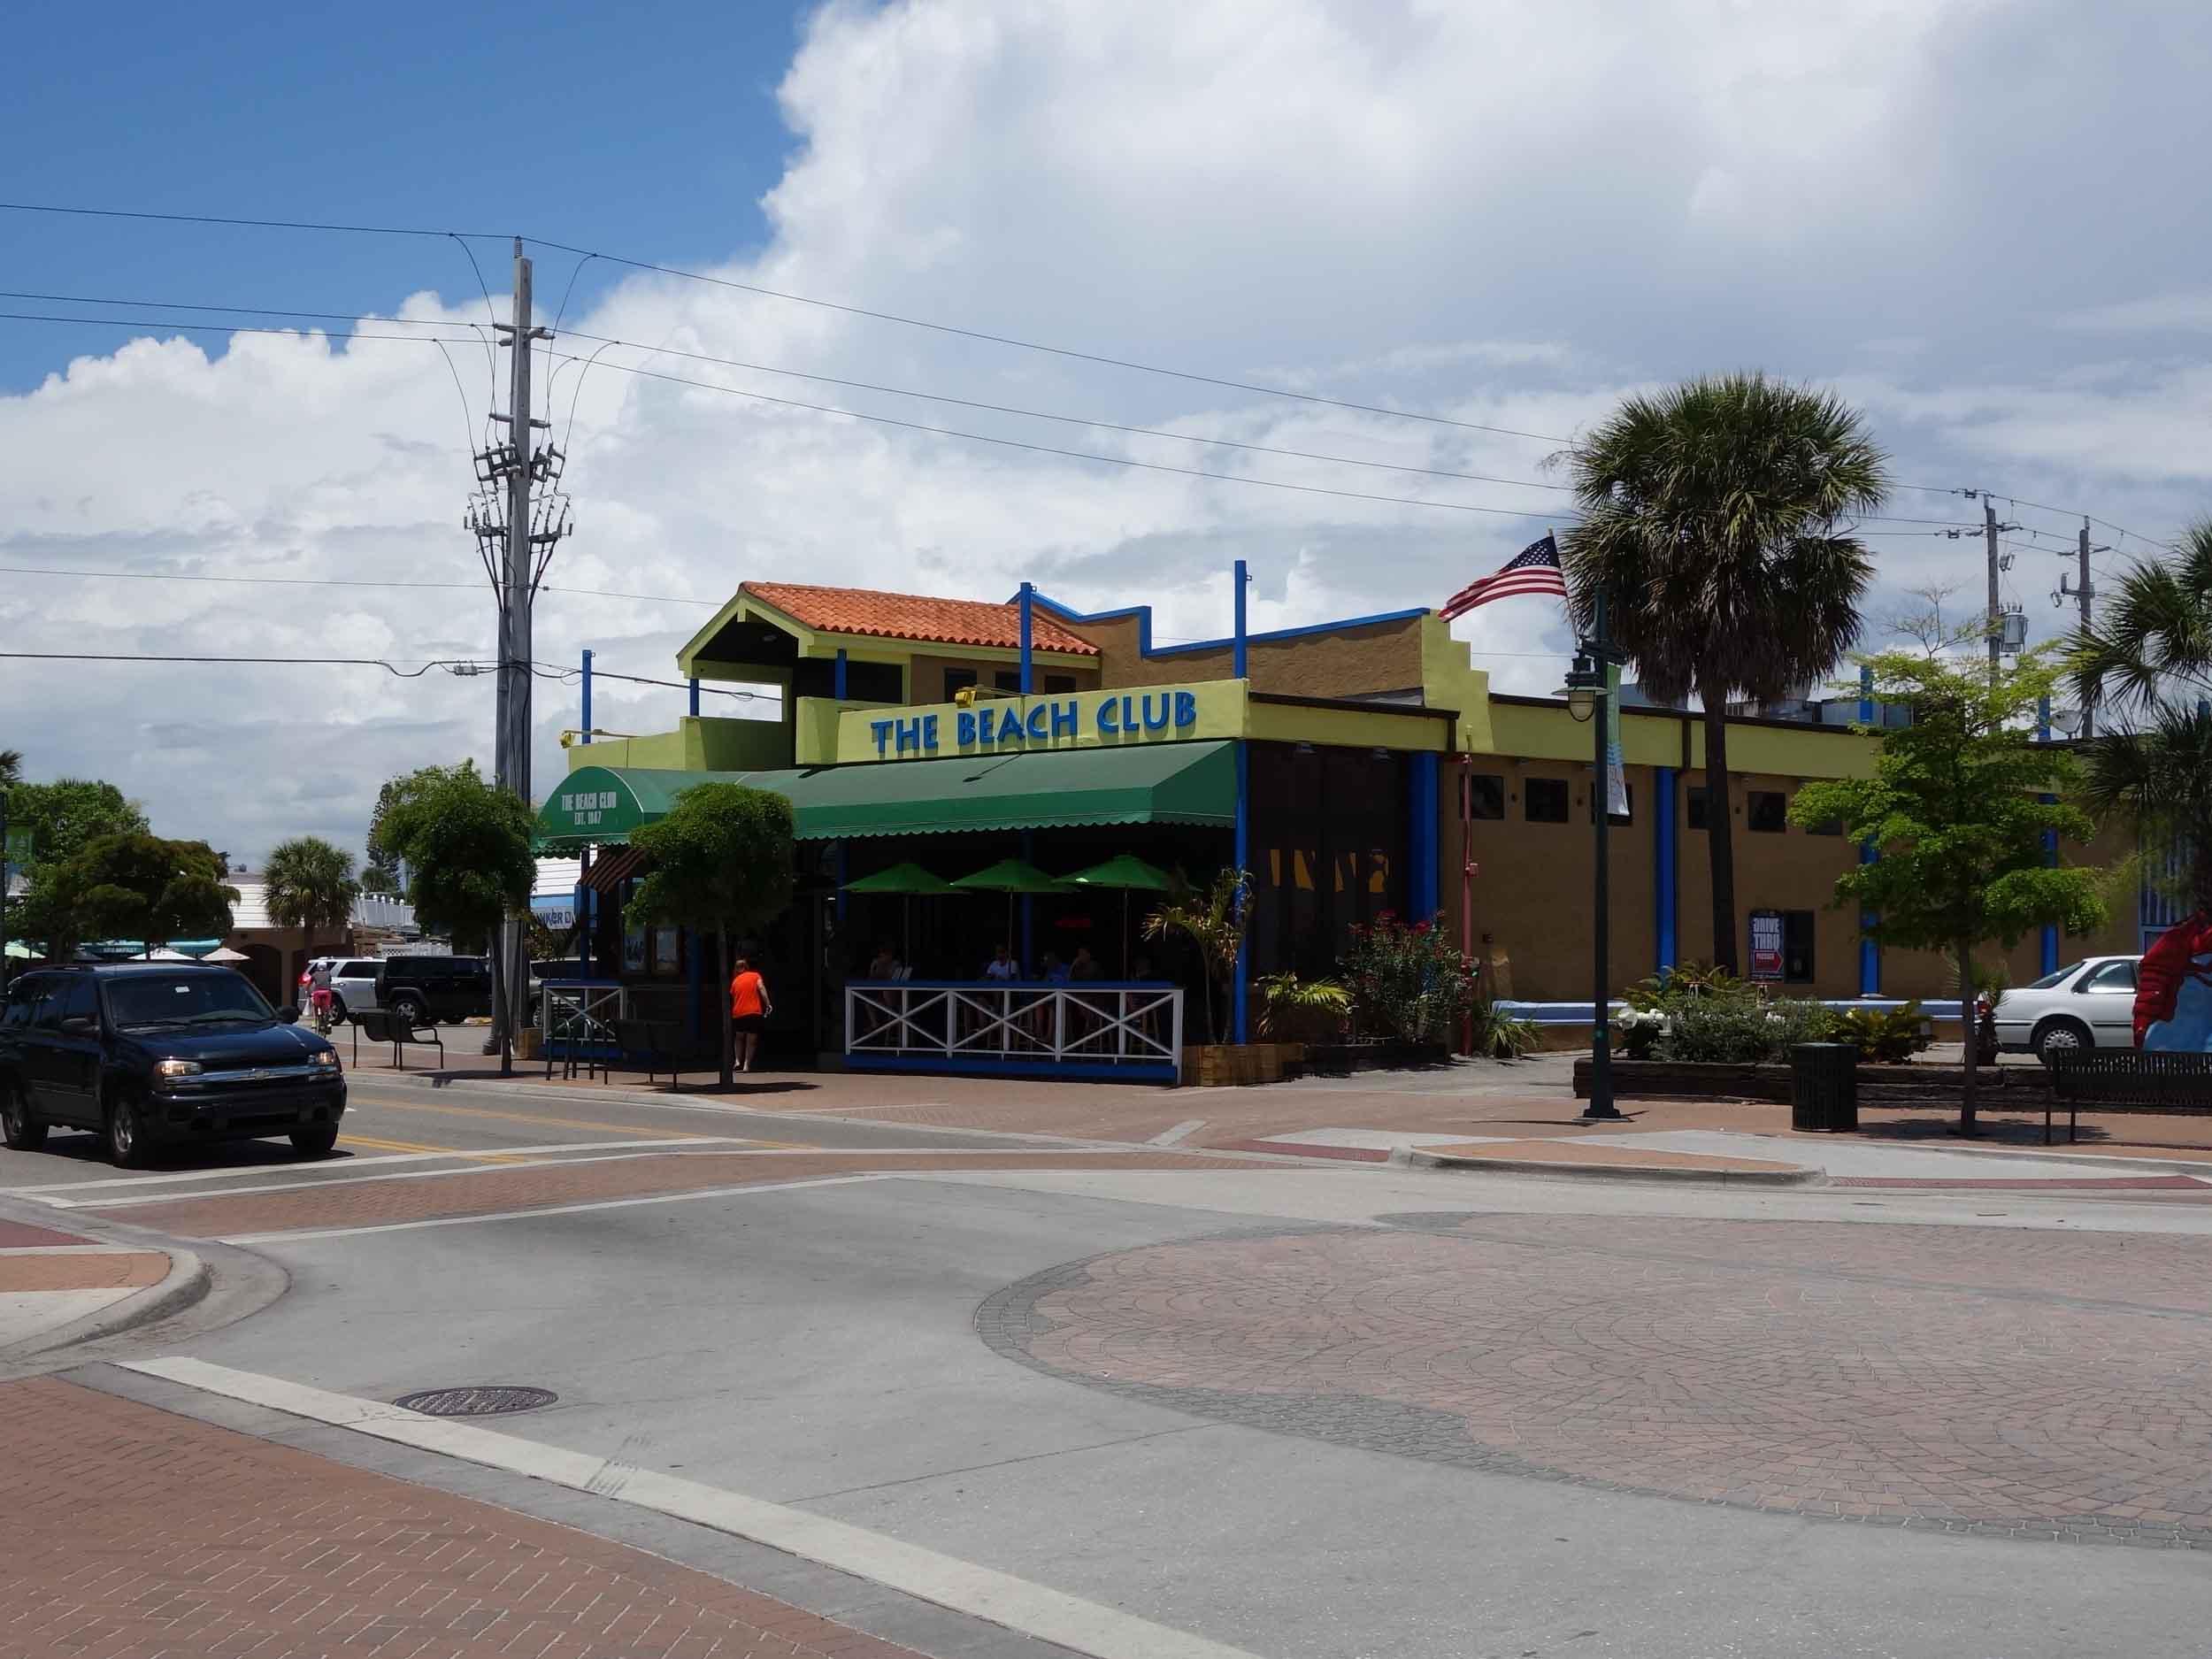 The Beach Club Exterior